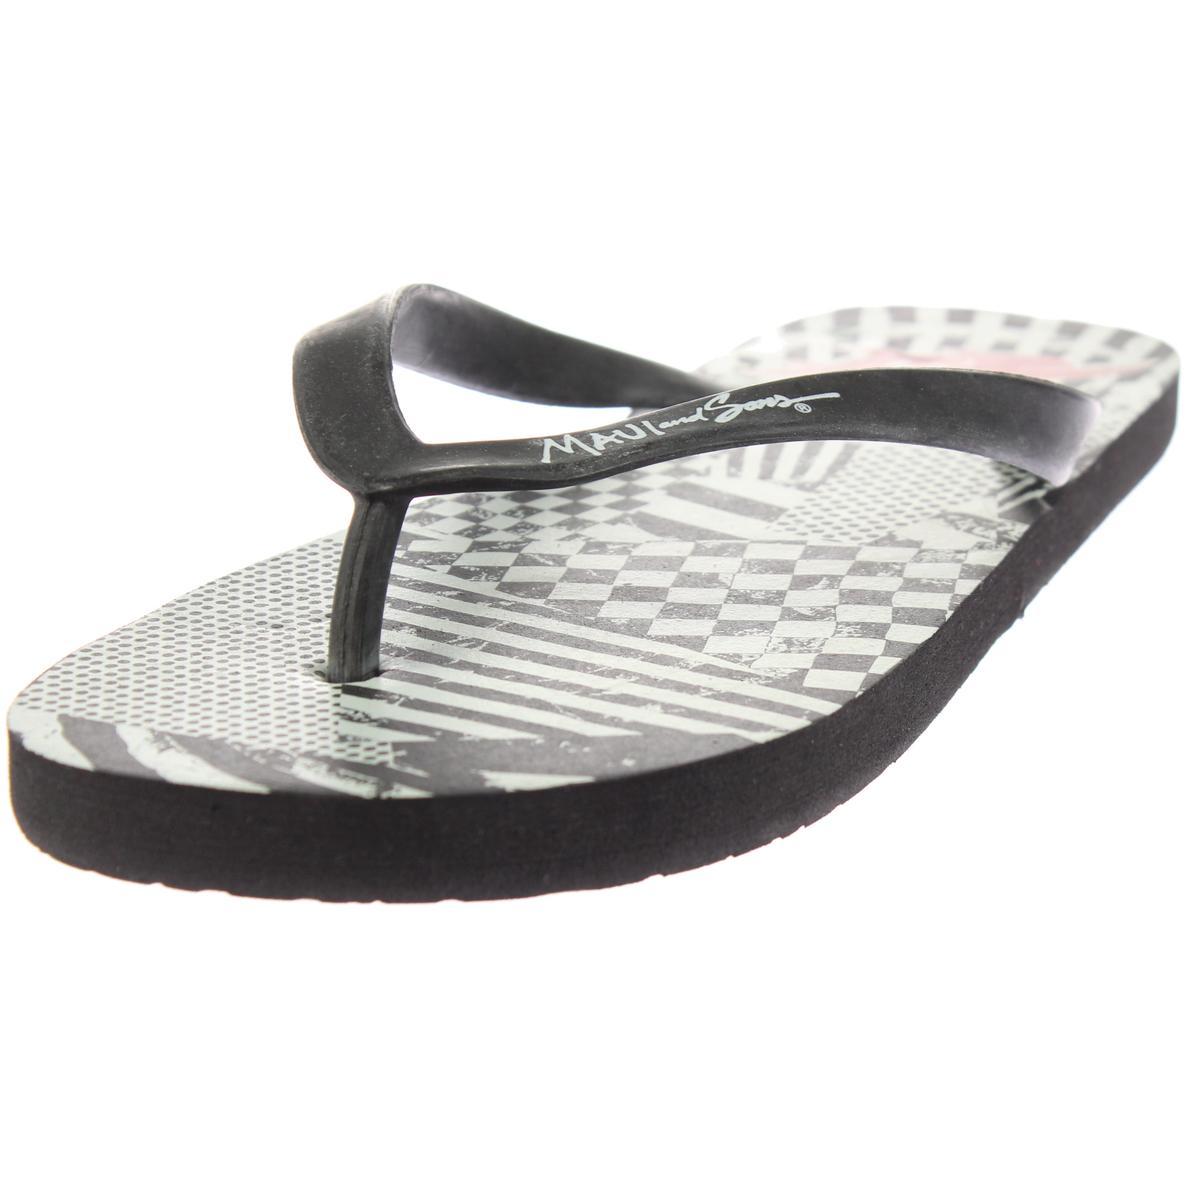 Maui and Sons Mens Graphic Slide Flip-Flops Sandals BHFO 6946